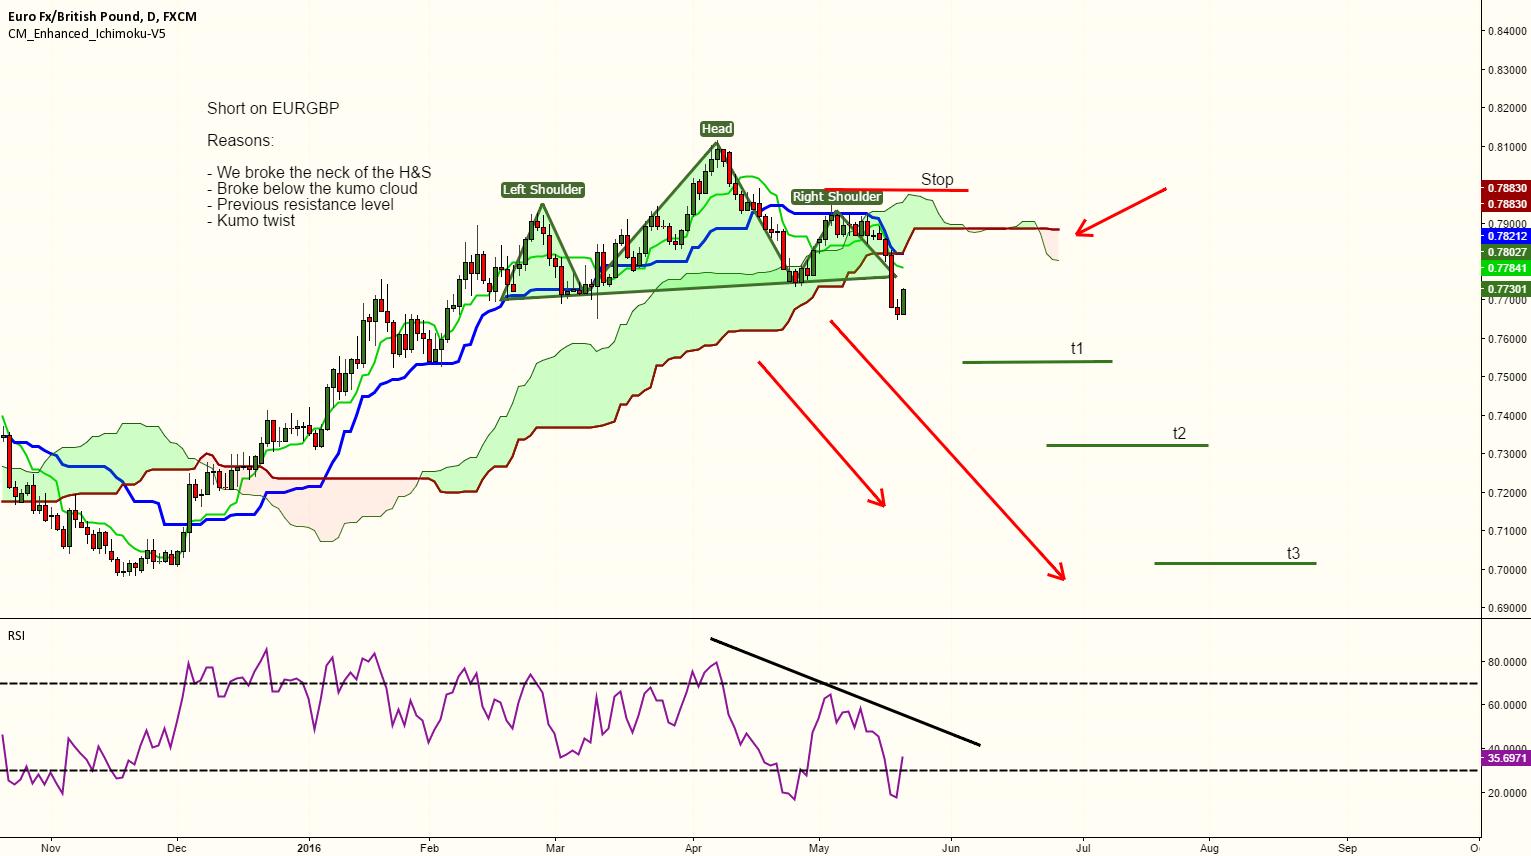 EURGBP outlook - short!